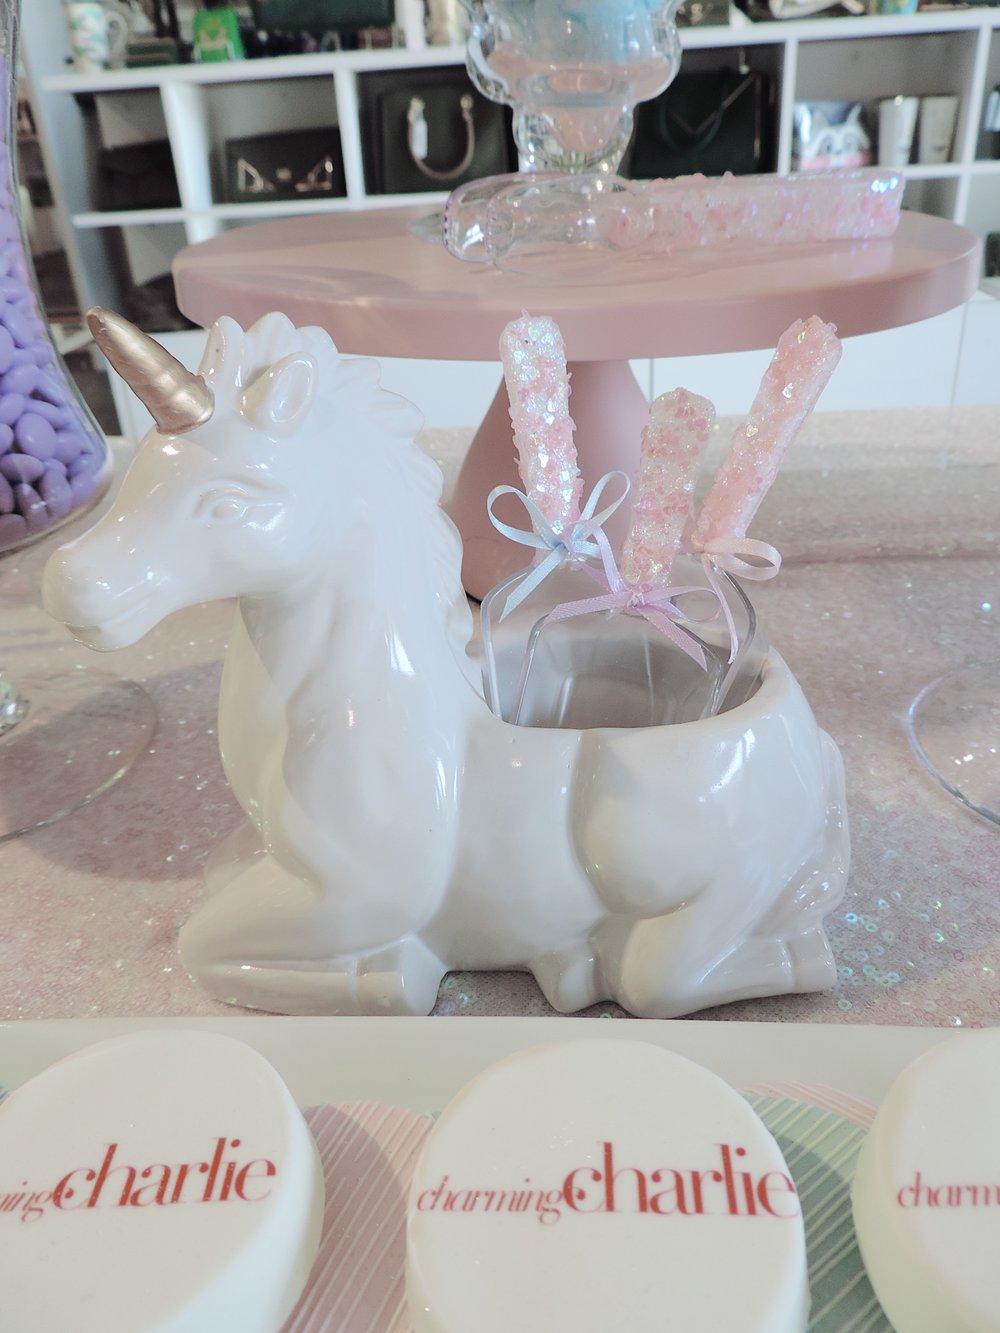 Charming Charlie-Loey Lane-SugarPartiesLA-Dessert Table-unicorn-candy holders.JPG